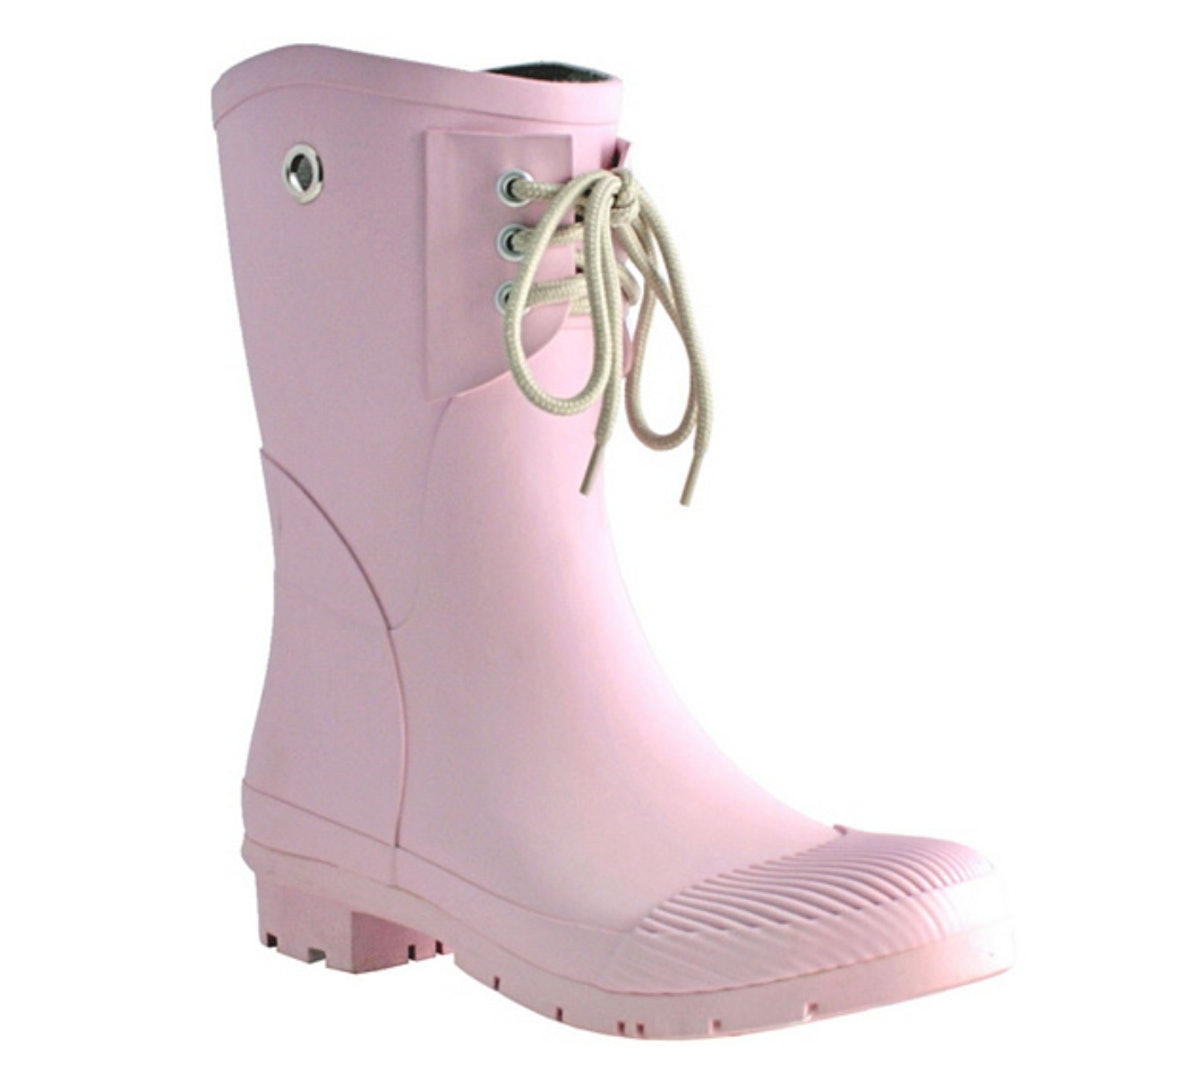 Nomad Rubber Rain Boots